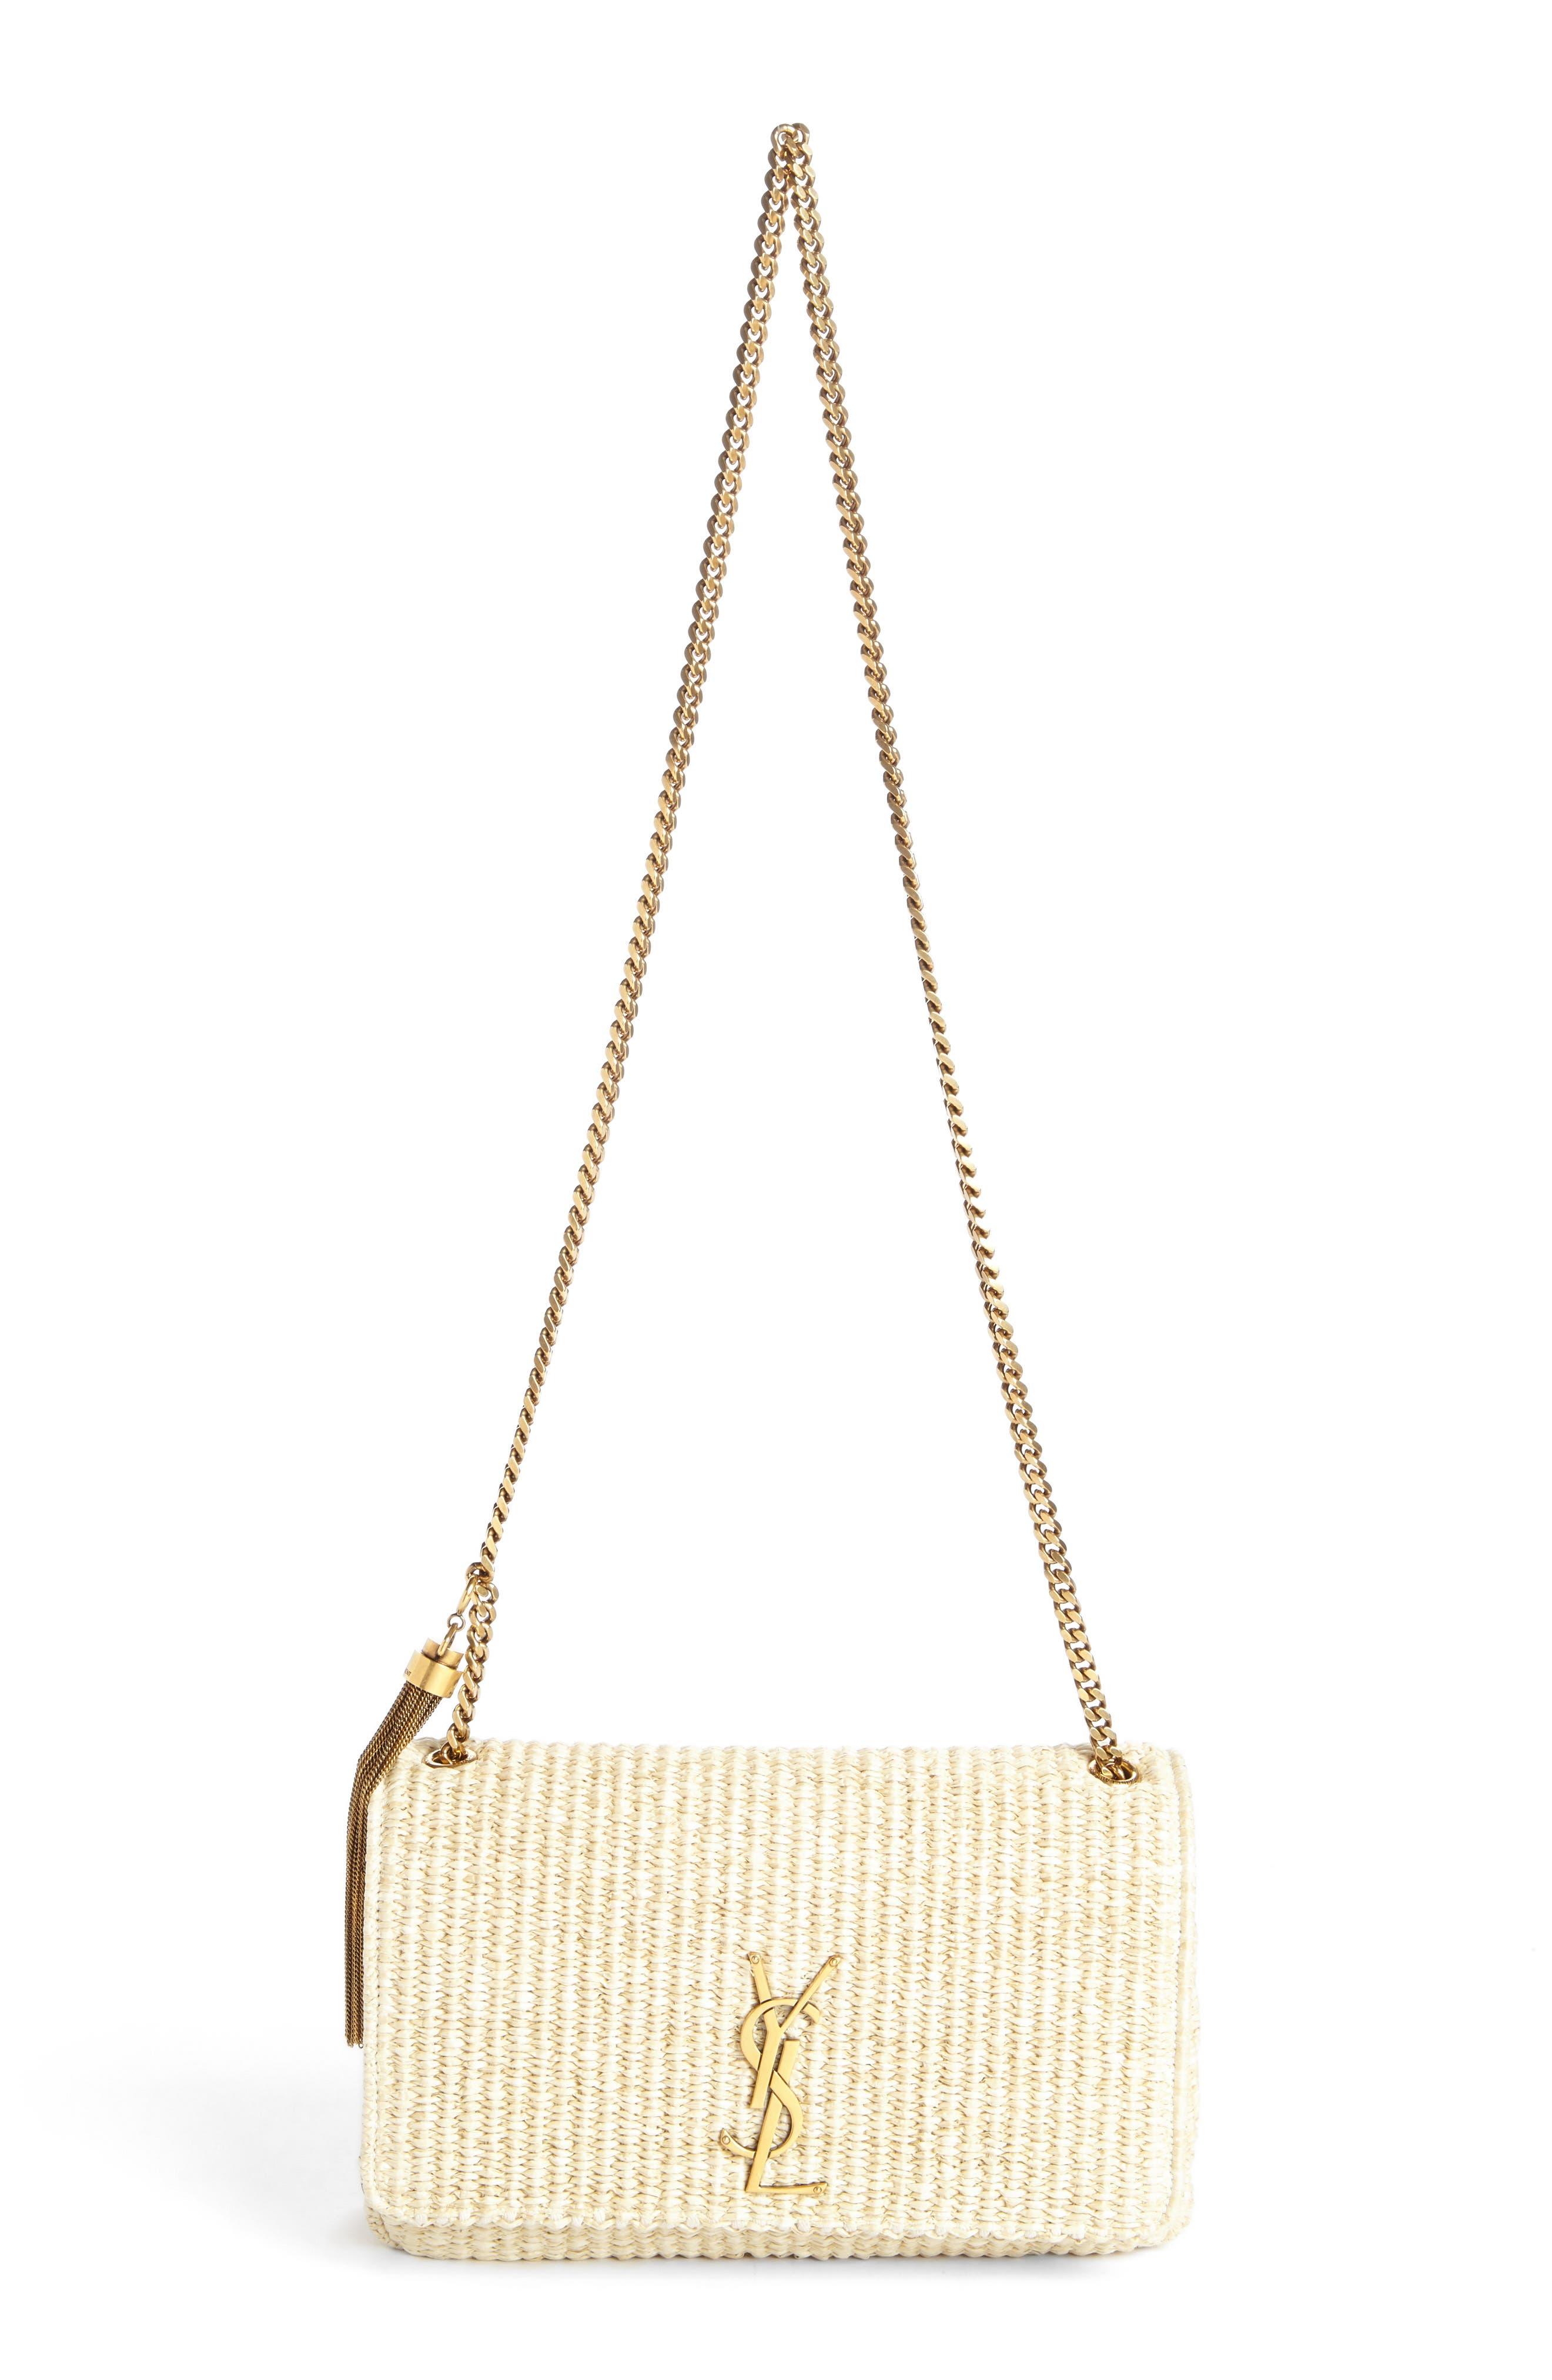 Alternate Image 1 Selected - Saint Laurent Medium Kate Raffia Shoulder Bag